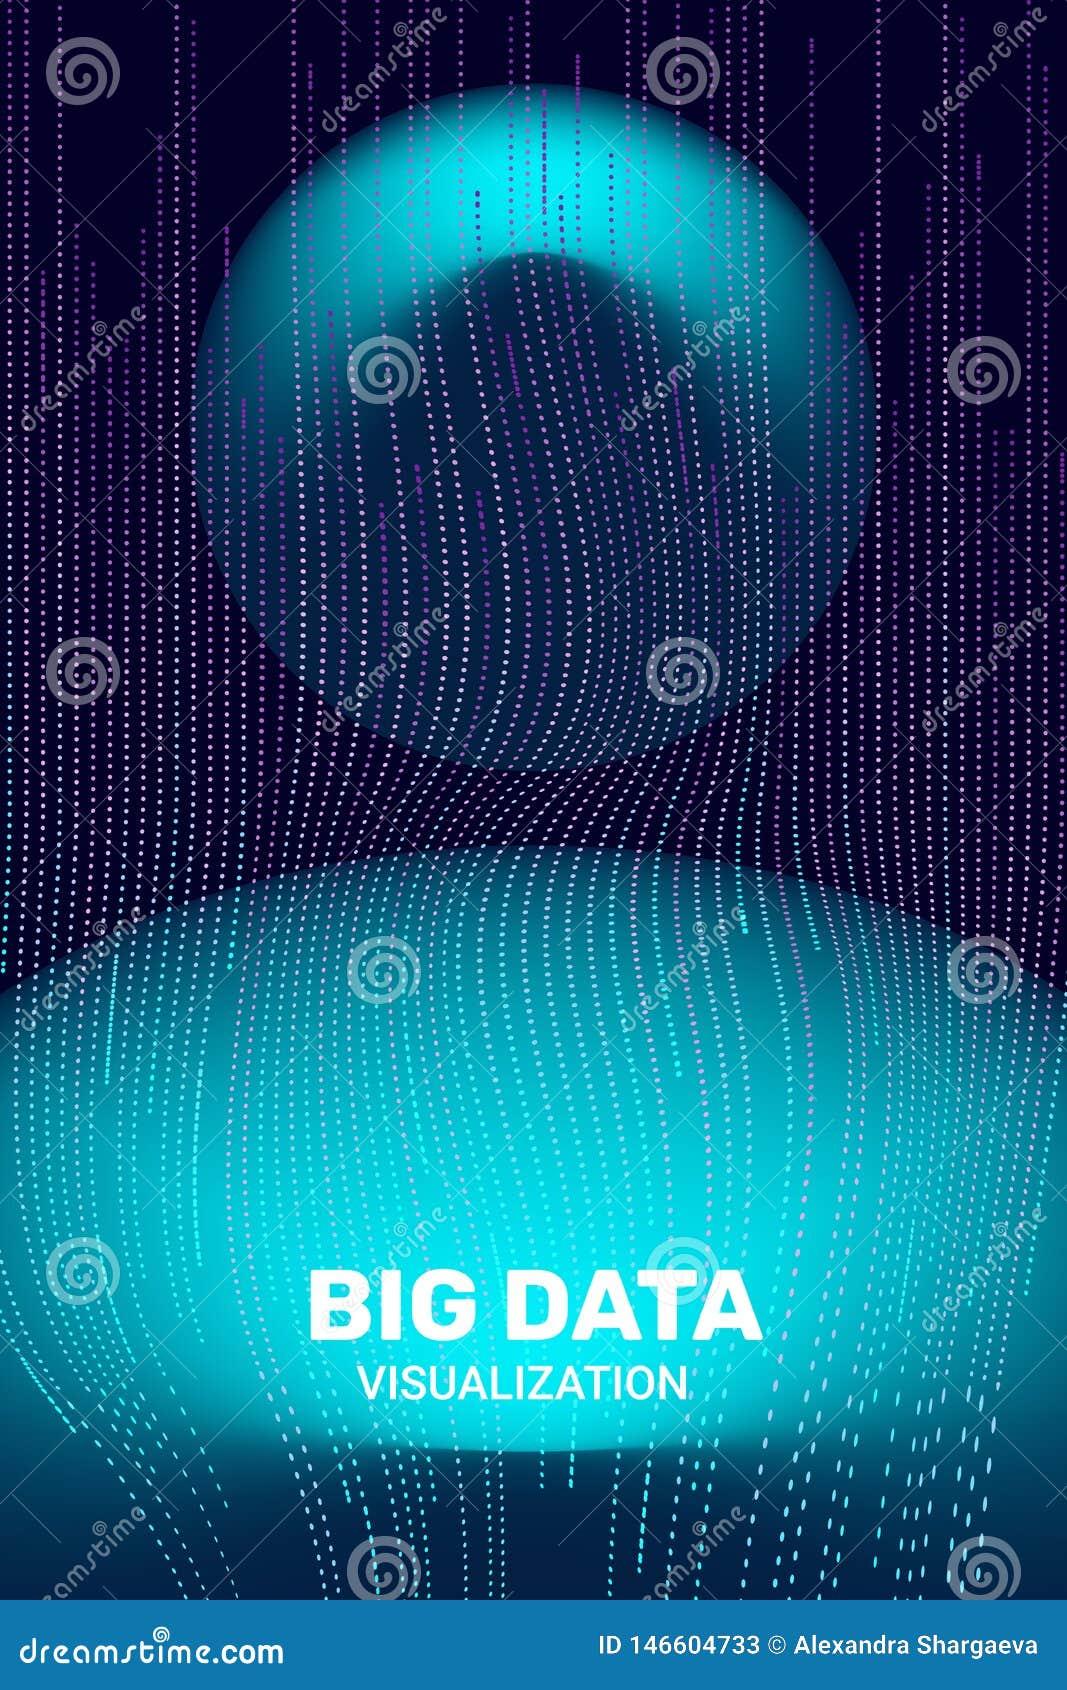 Big Data Visualization. 3D Futuristic Information.